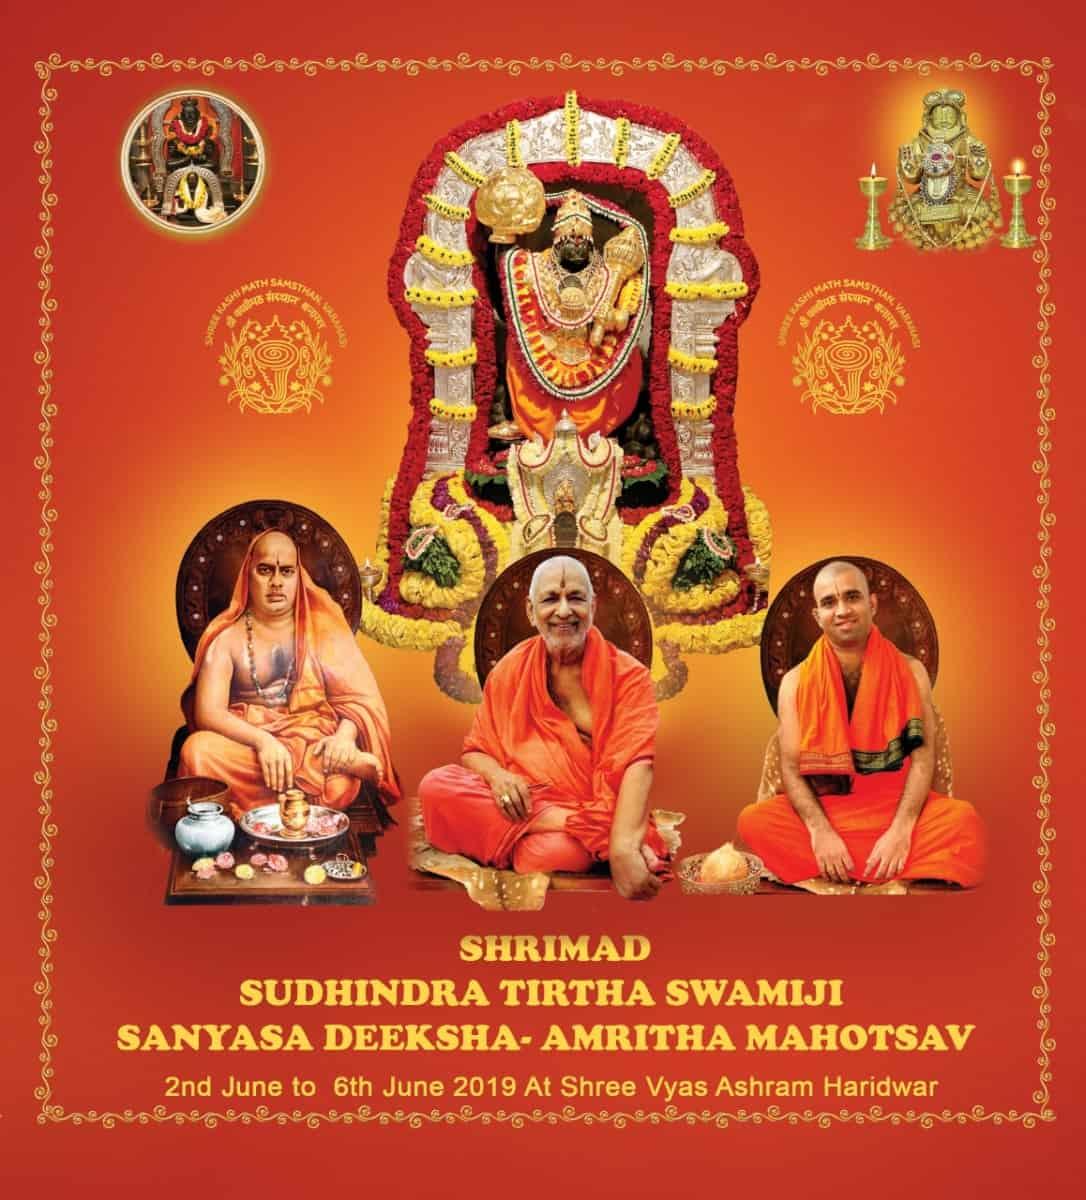 Sanyasa Deeksha - Amritha Mahotsav, Haridwar